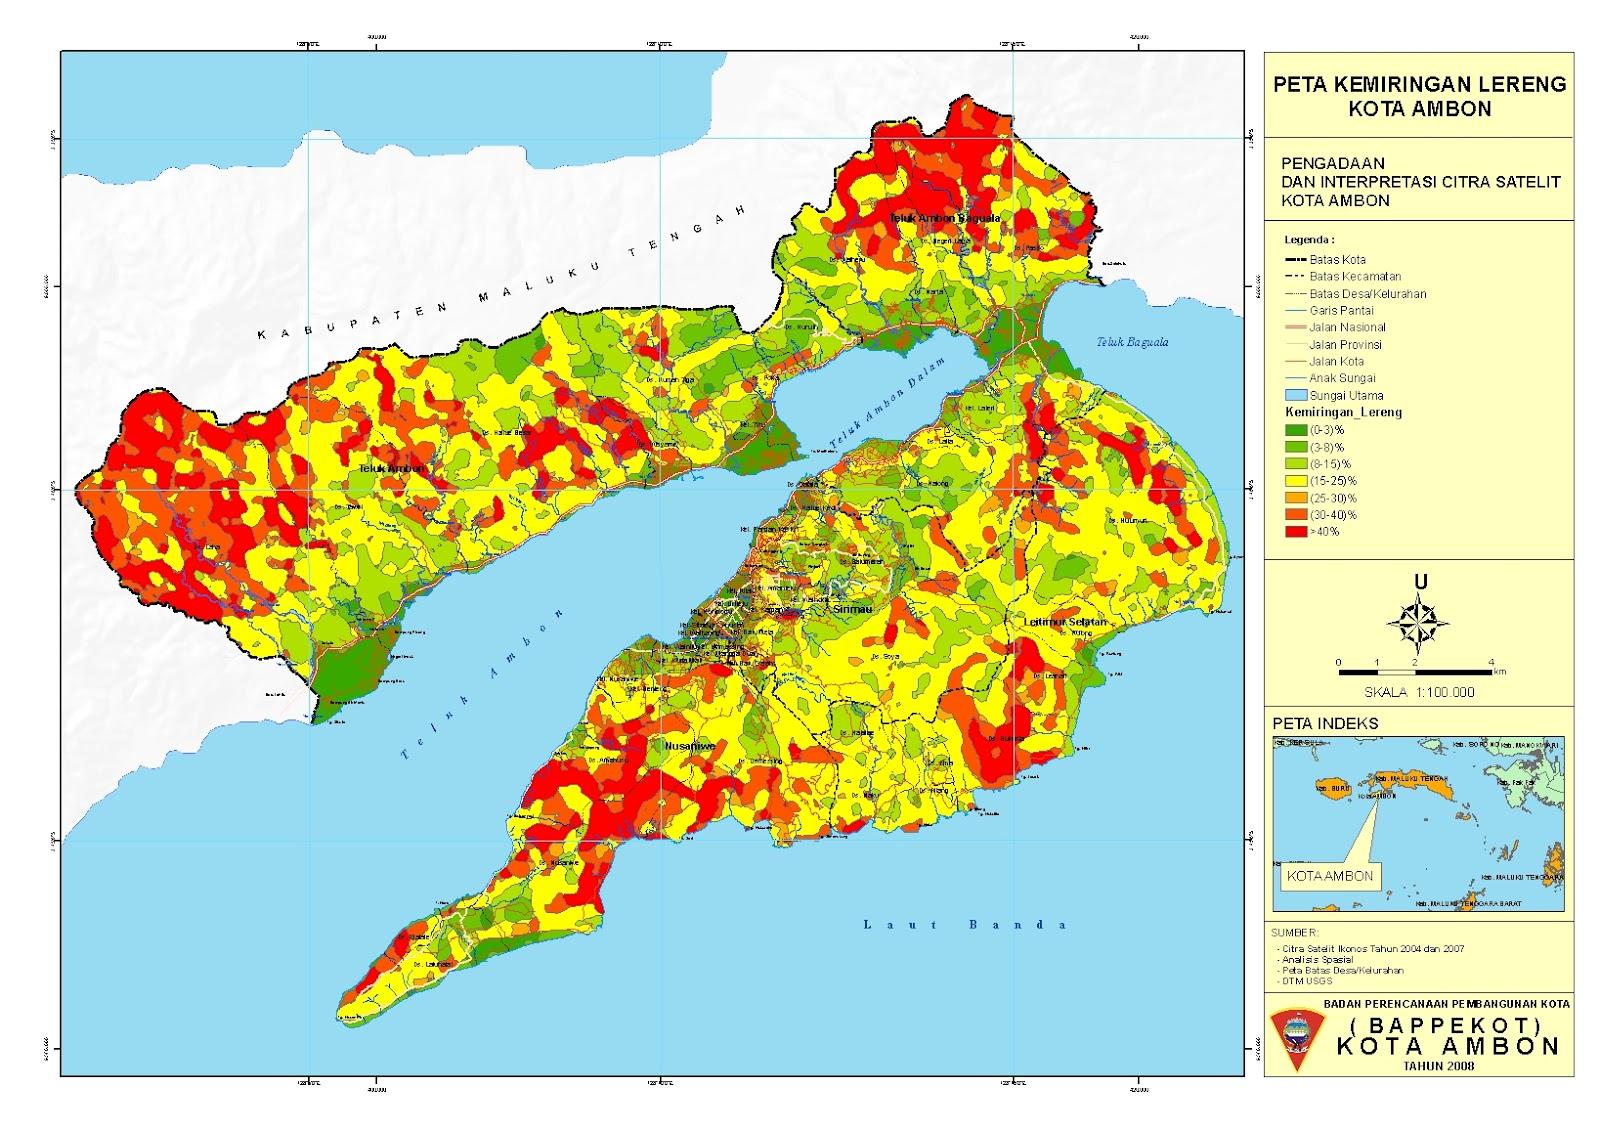 Tampayang Maluku: Koleksi Peta Kota Ambon